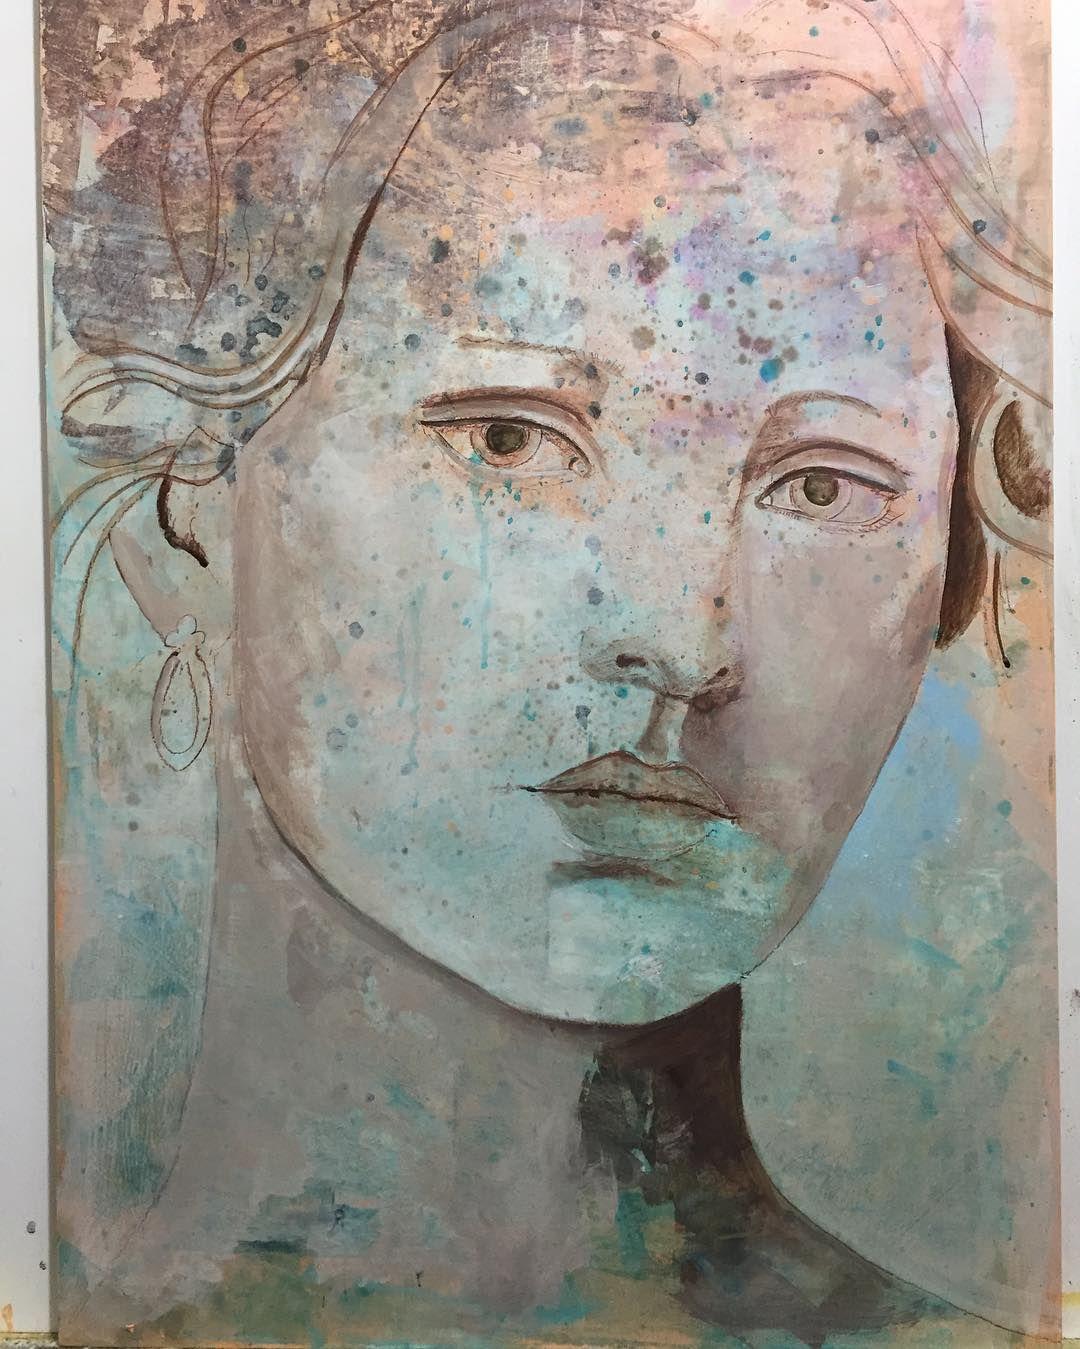 in progress  1 Stage #artist #art ##artwork #artnews #arte #original art #portrait #beautiful #fullcolor #almazzaglia #oilpainting #acrylics